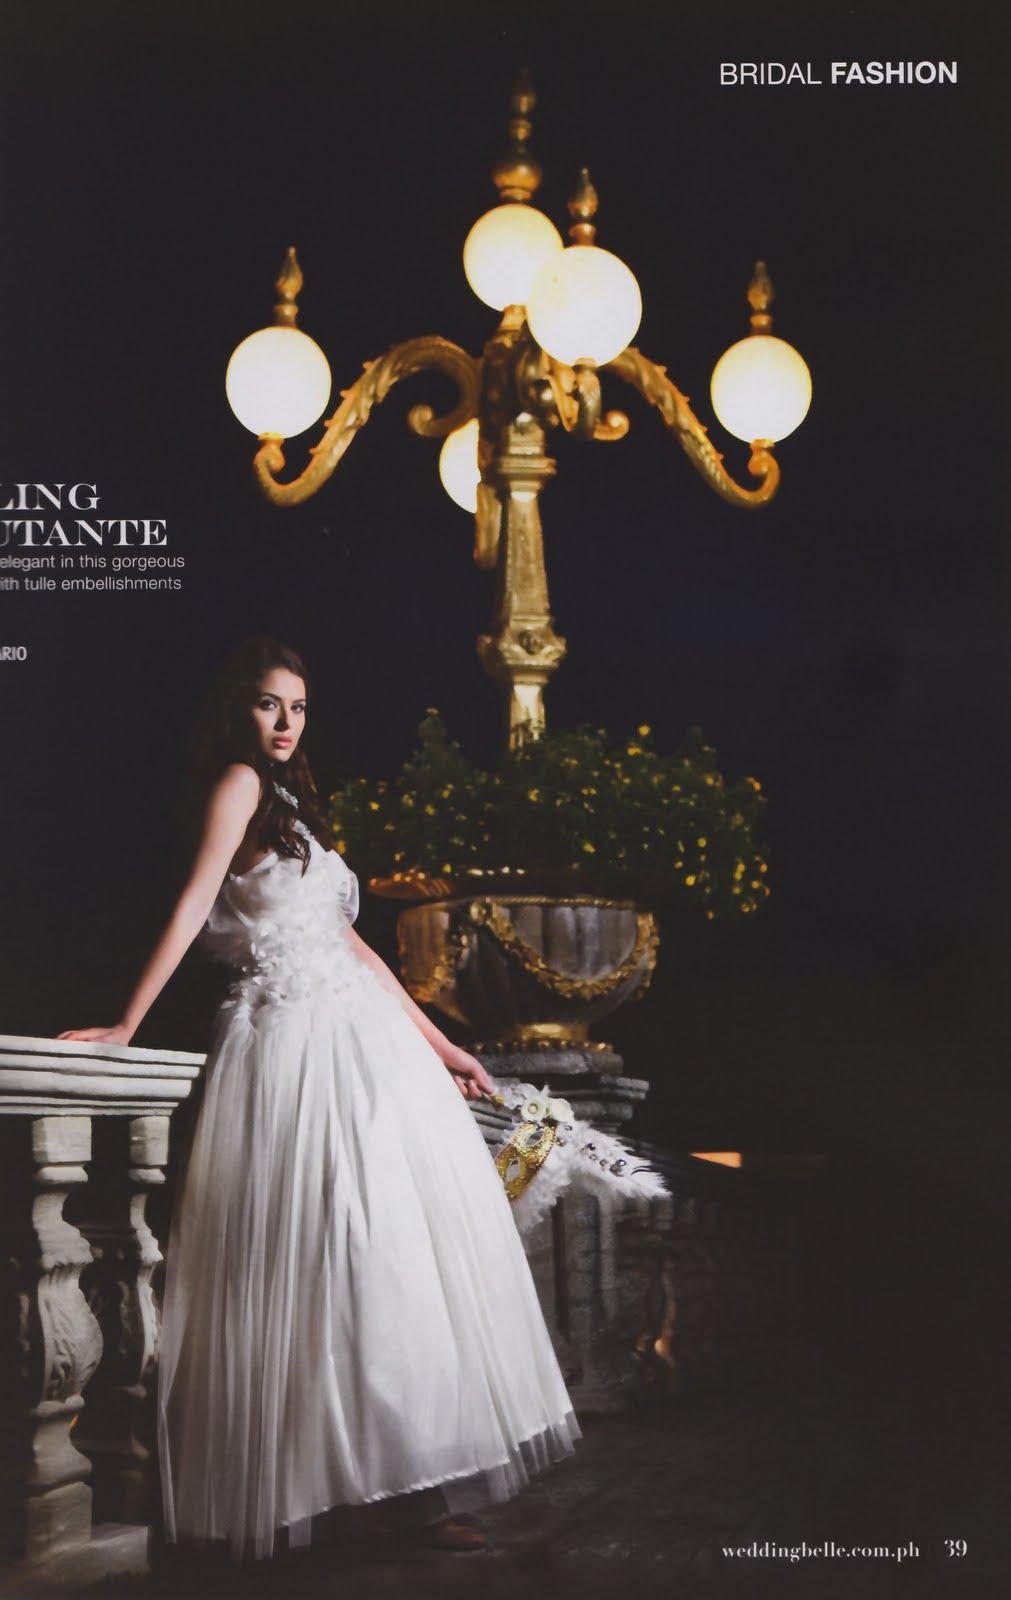 ⊰✿• .¸¸.⊰ Galeria de Priscilla Meirelles, Miss Earth 2004.⊰✿• .¸¸.⊰  - Página 3 Wedding%2BBelle%2B(Oct%2B2009)%2B7